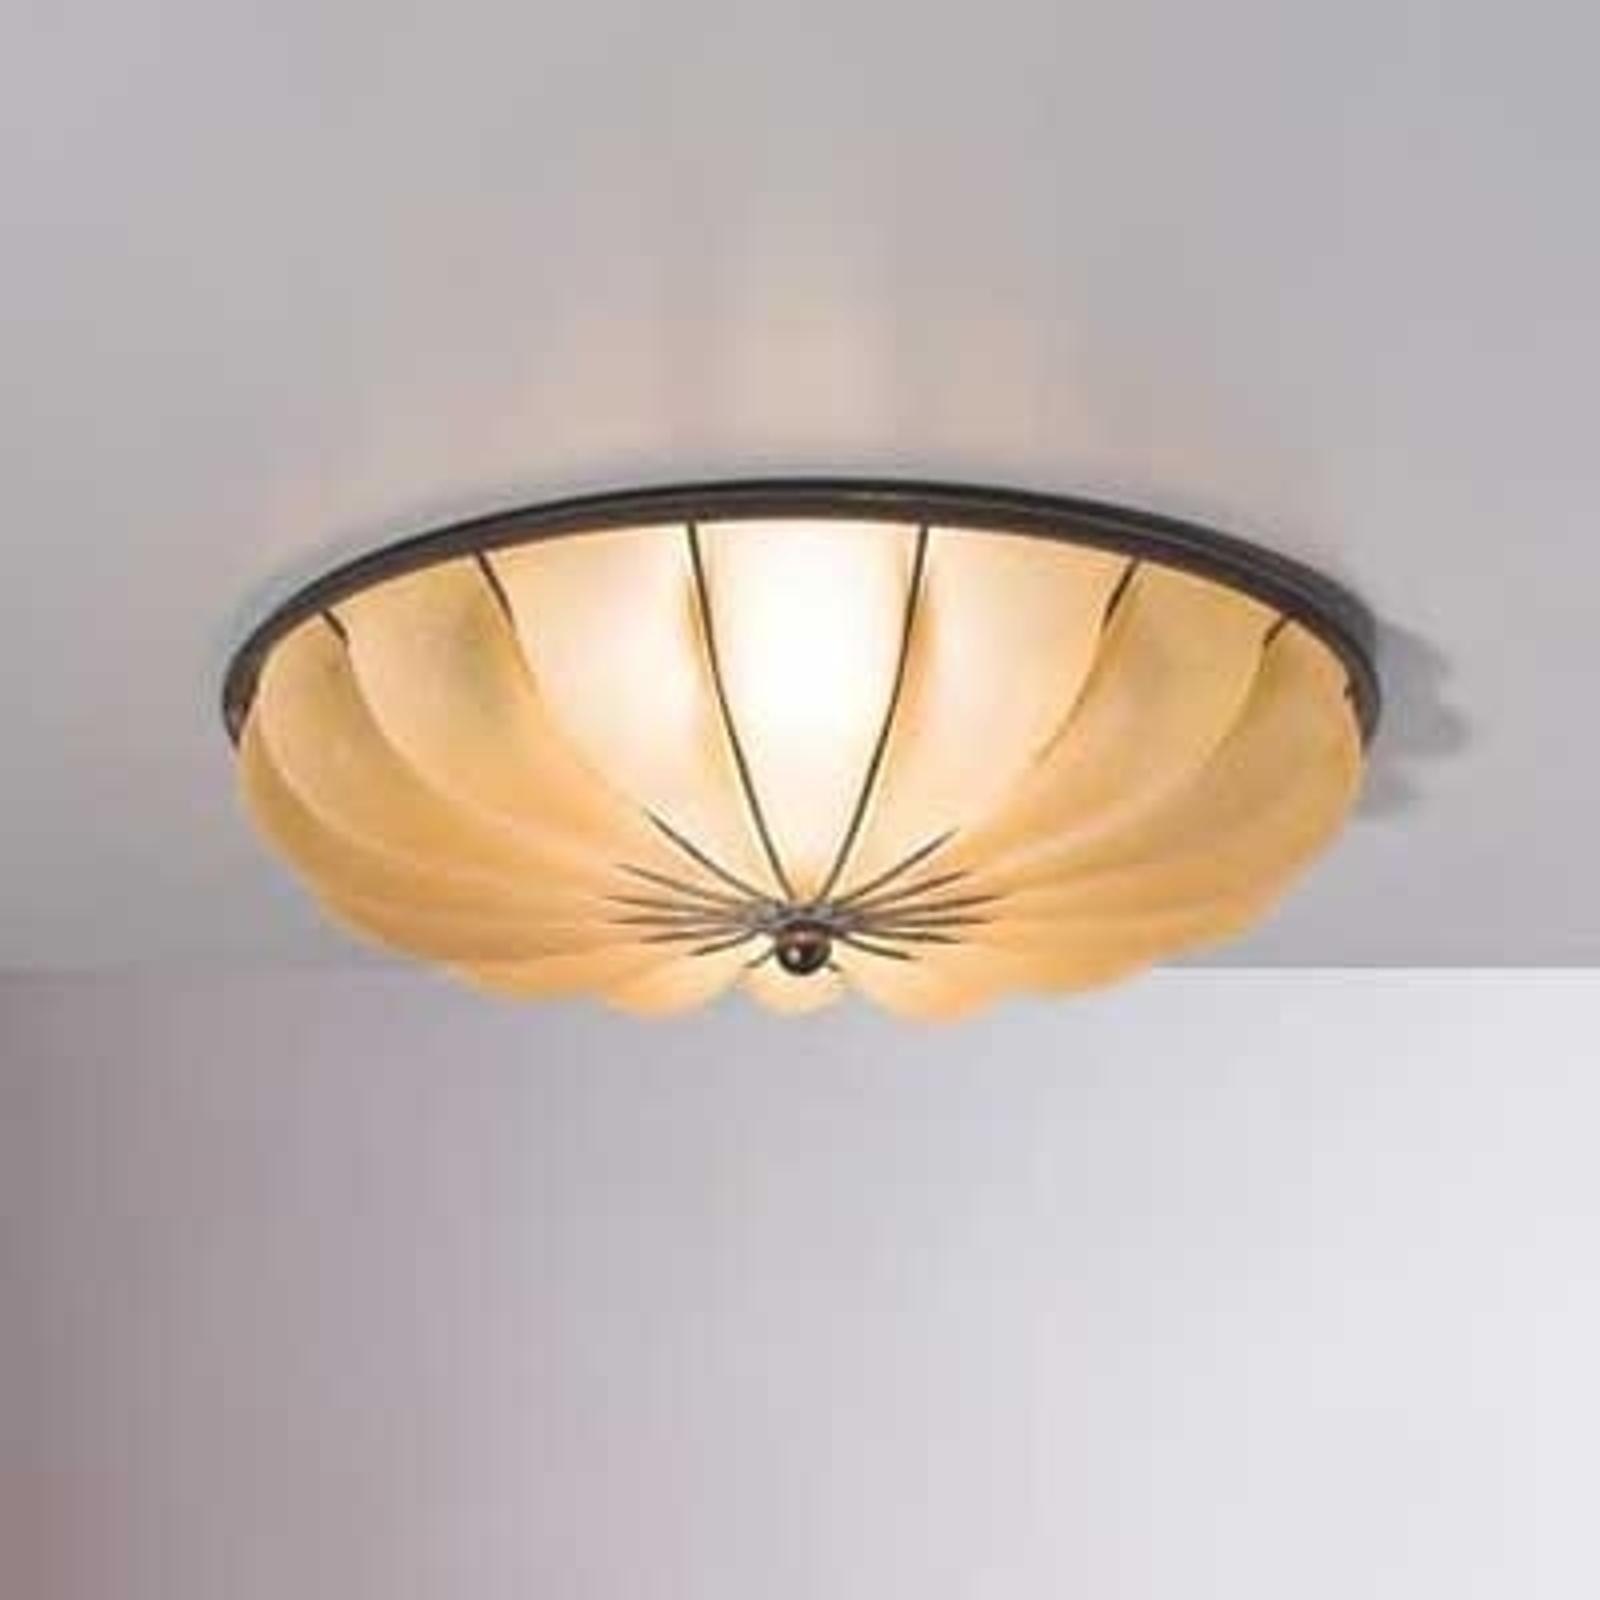 RAGGIO halvrund loftlampe 33 cm